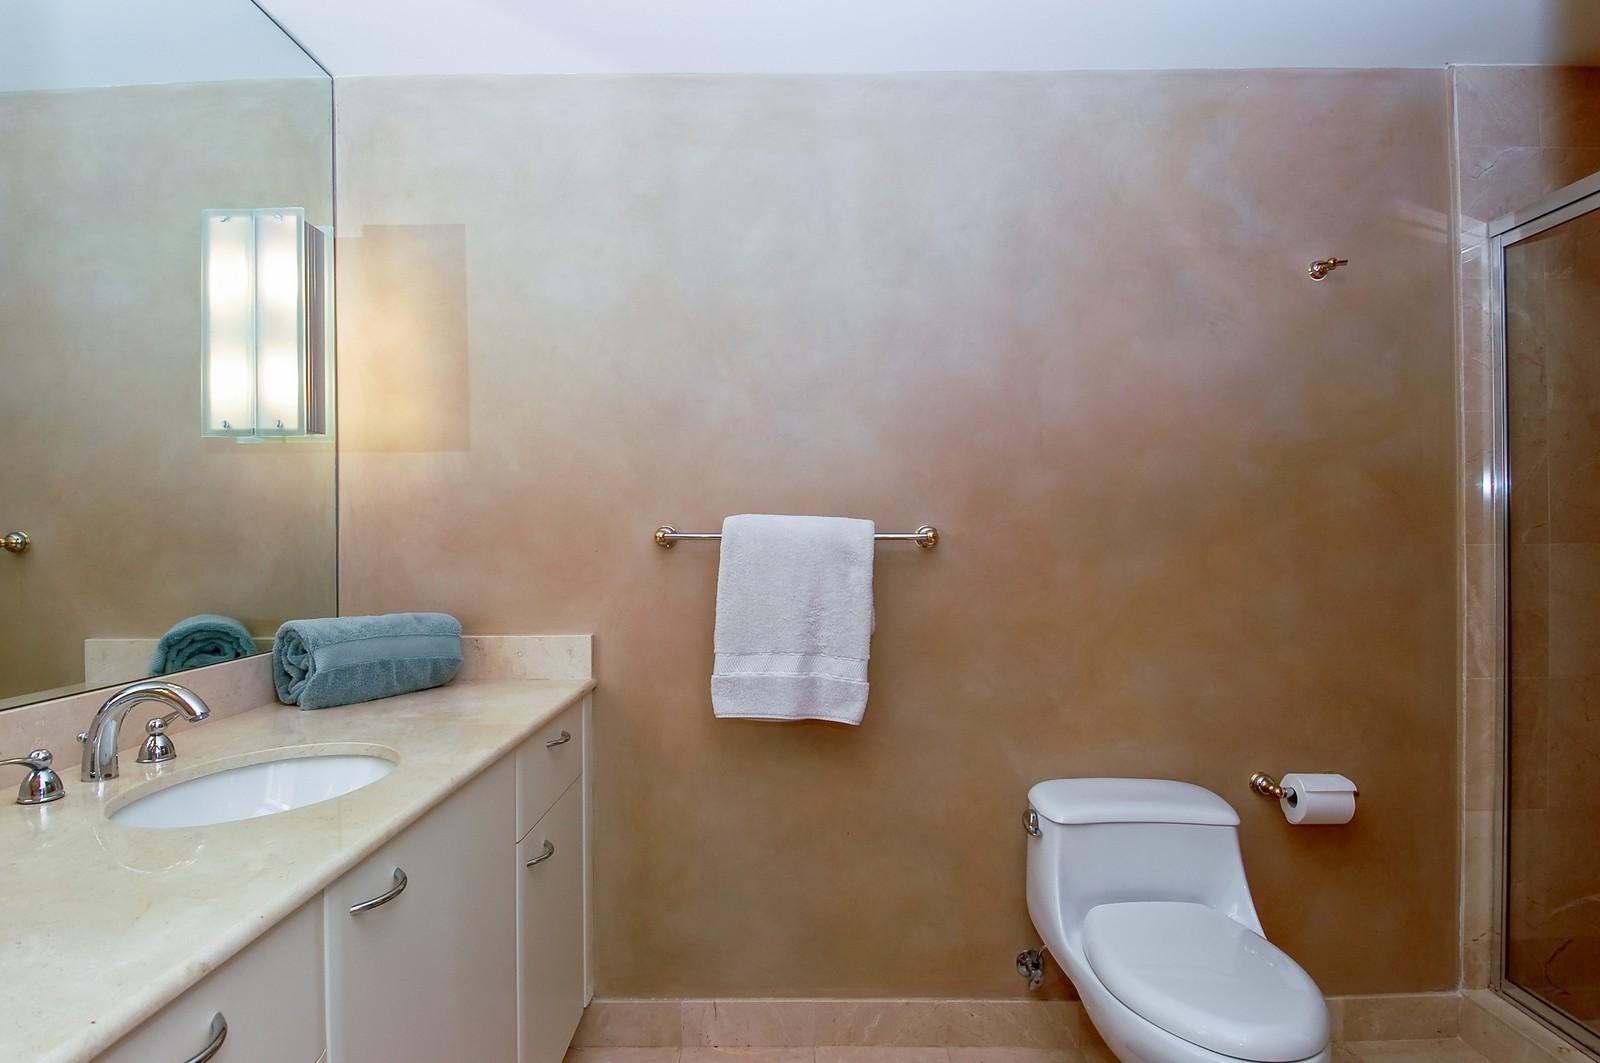 Real Estate Photography - 1600 S Ocean Blvd, Apt 802, Pompano Beach, FL, 33062 - 4th Bathroom